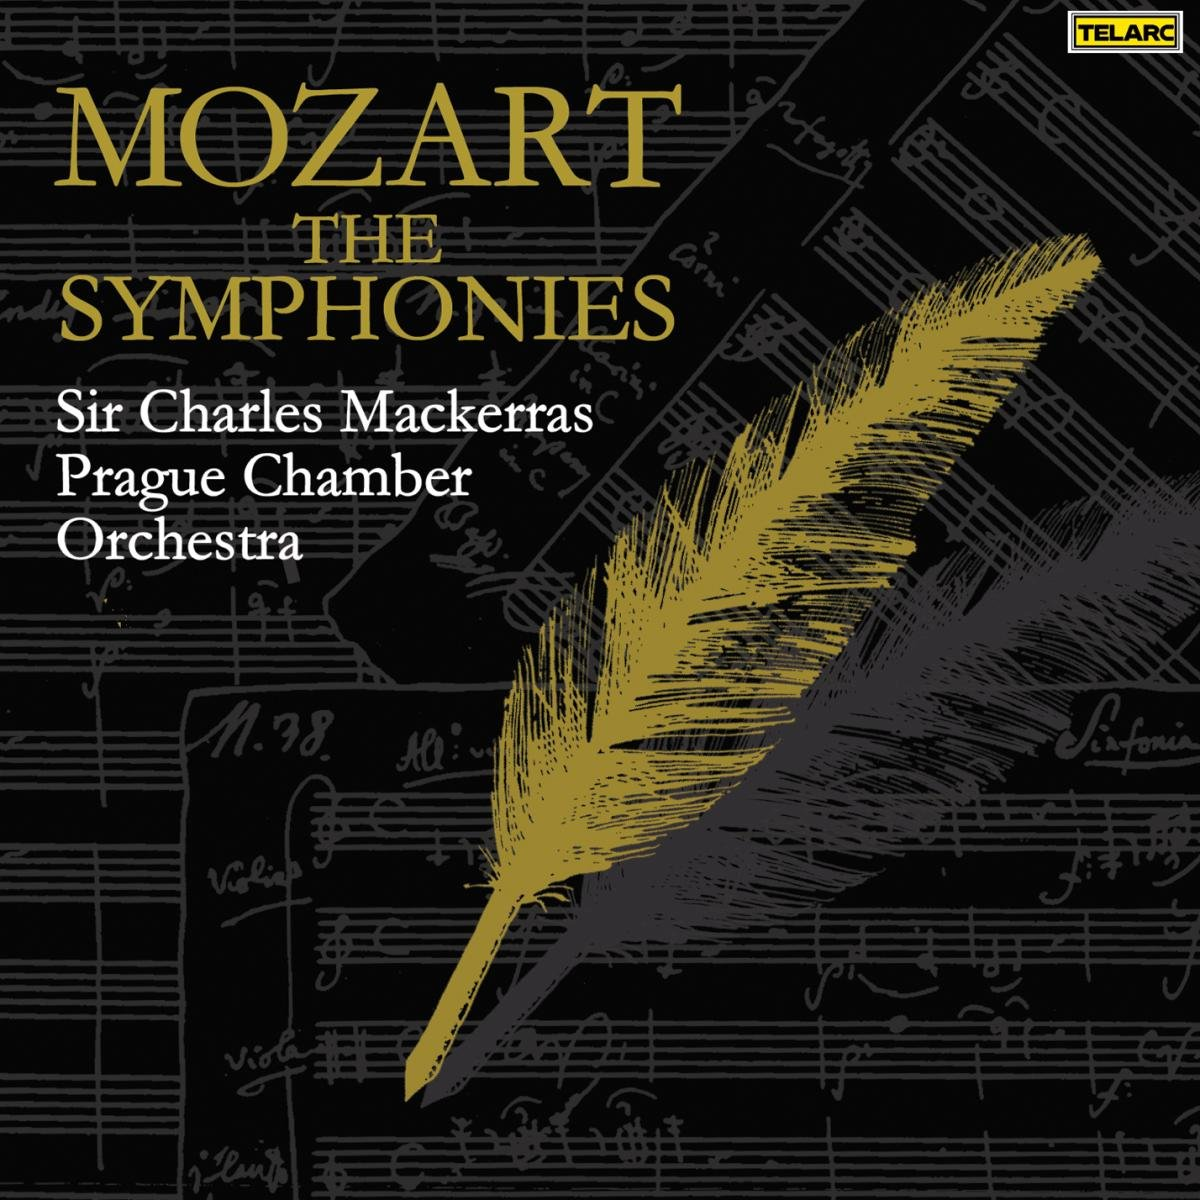 Mozart: The Symphonies [10 CD Box Set] by Telarc Distribution